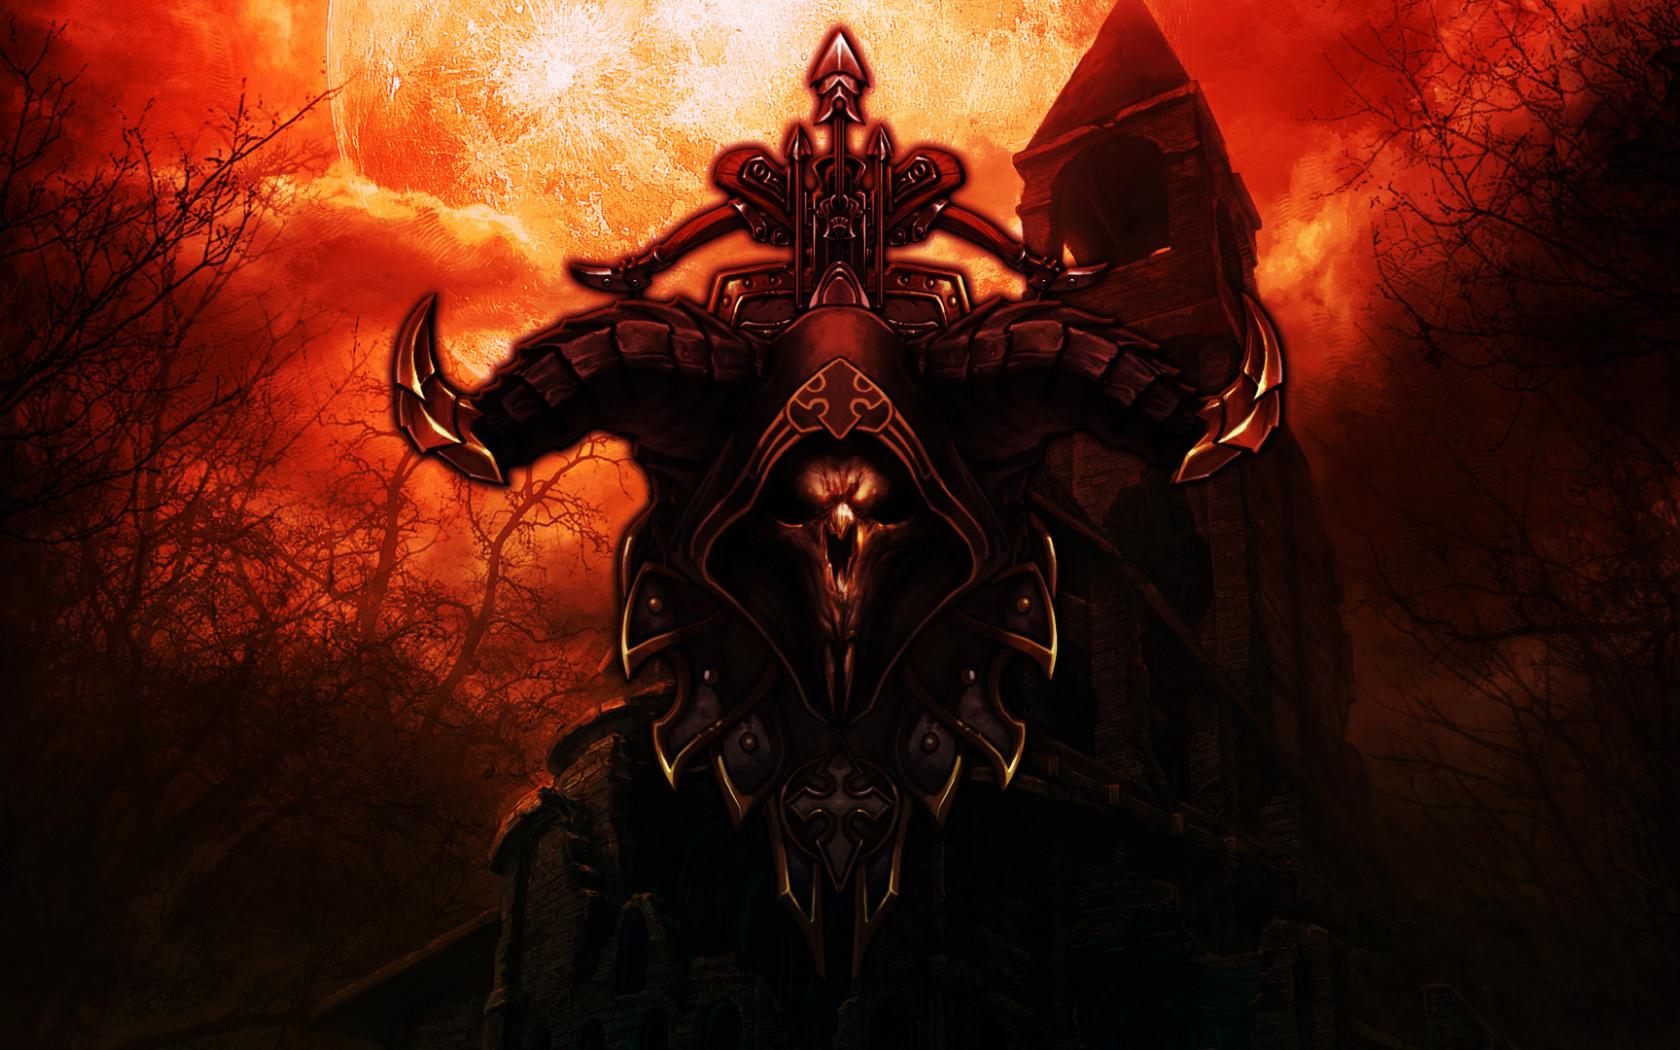 Free Download Diablo 3 Wallpaper Demon Hunter Wallpaper 1303390